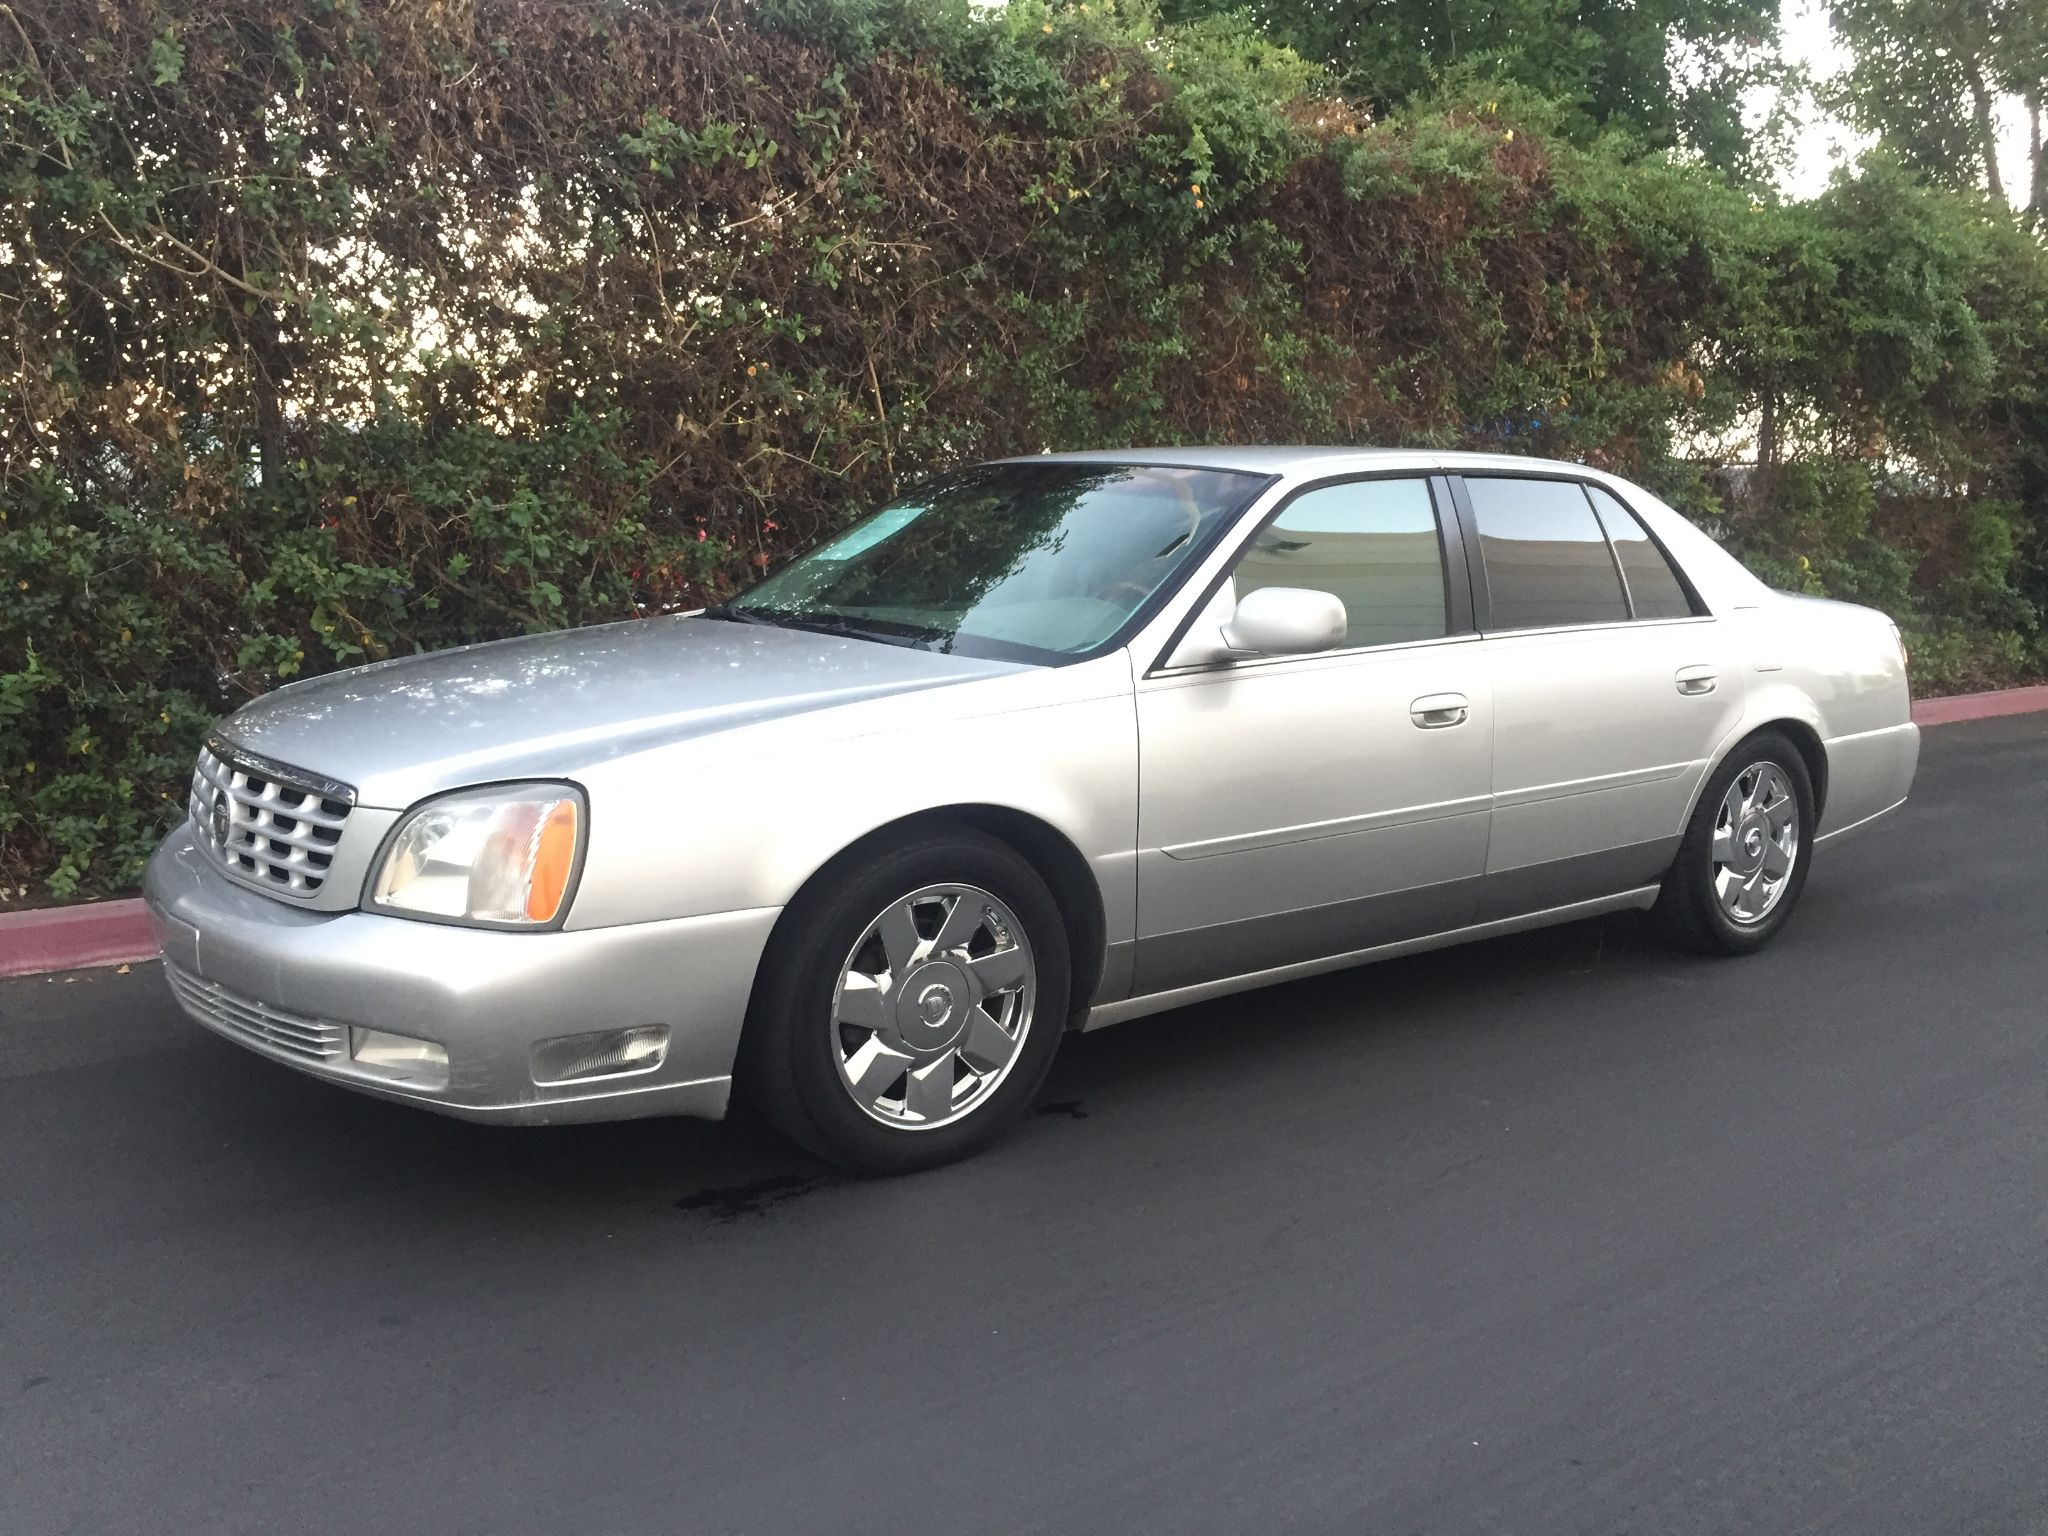 Used 2001 Cadillac DeVille DTS at City Cars Warehouse INC